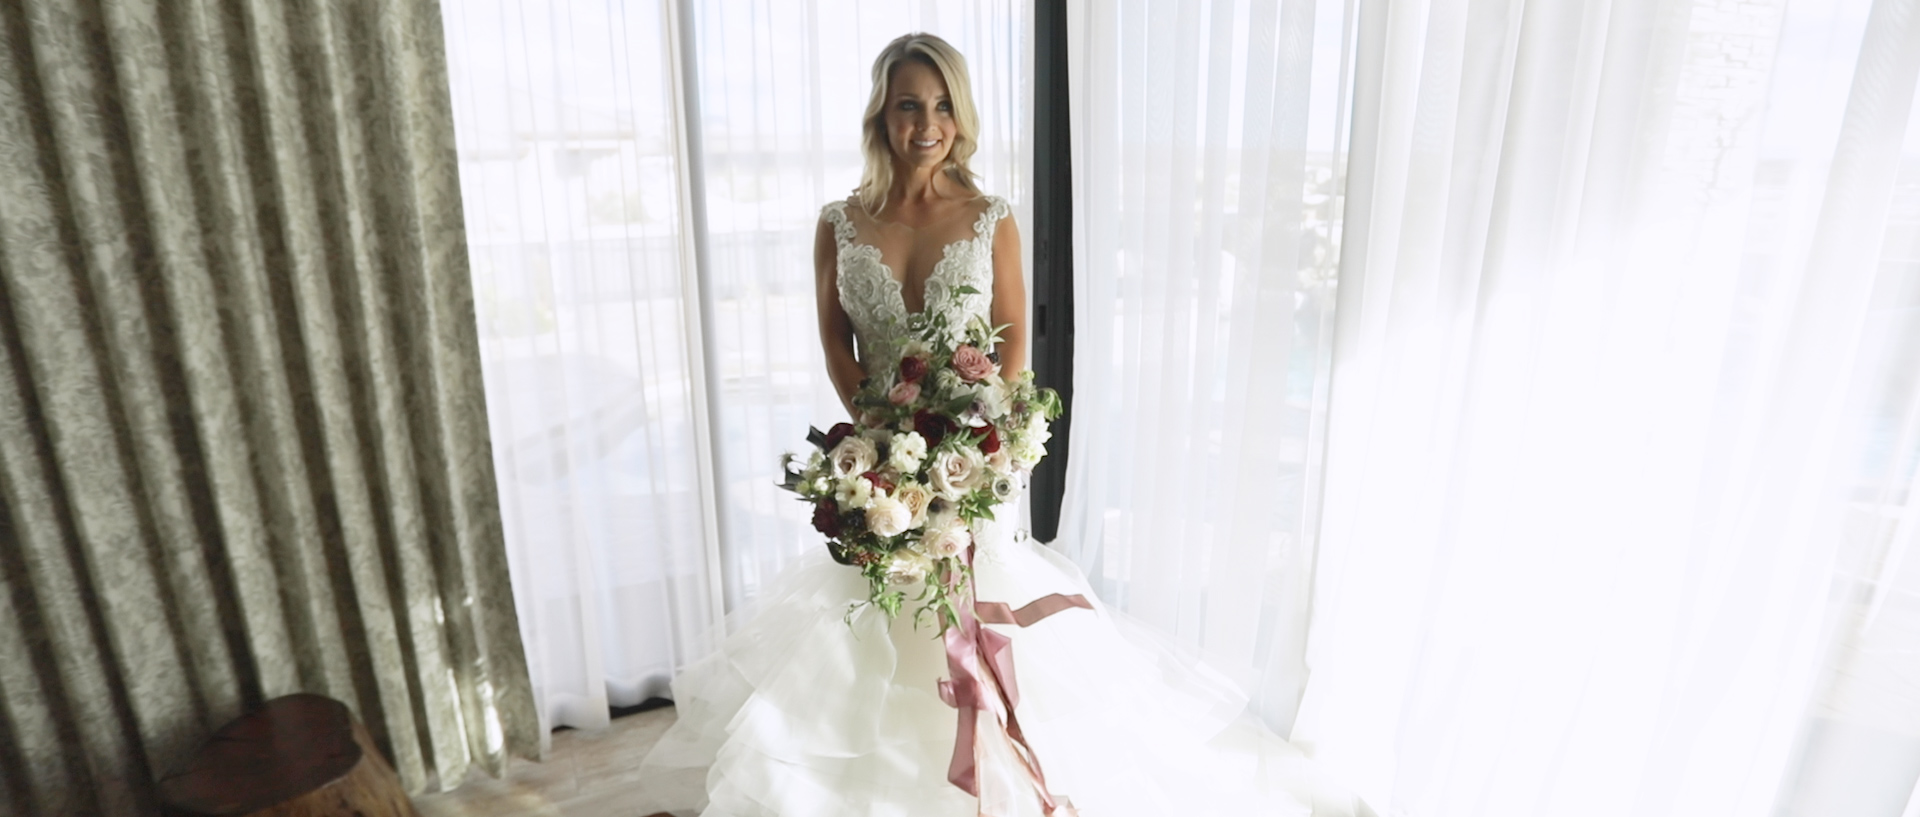 Jessica and Jeffrey Wedding Story.06_35_28_06.Still008.jpg